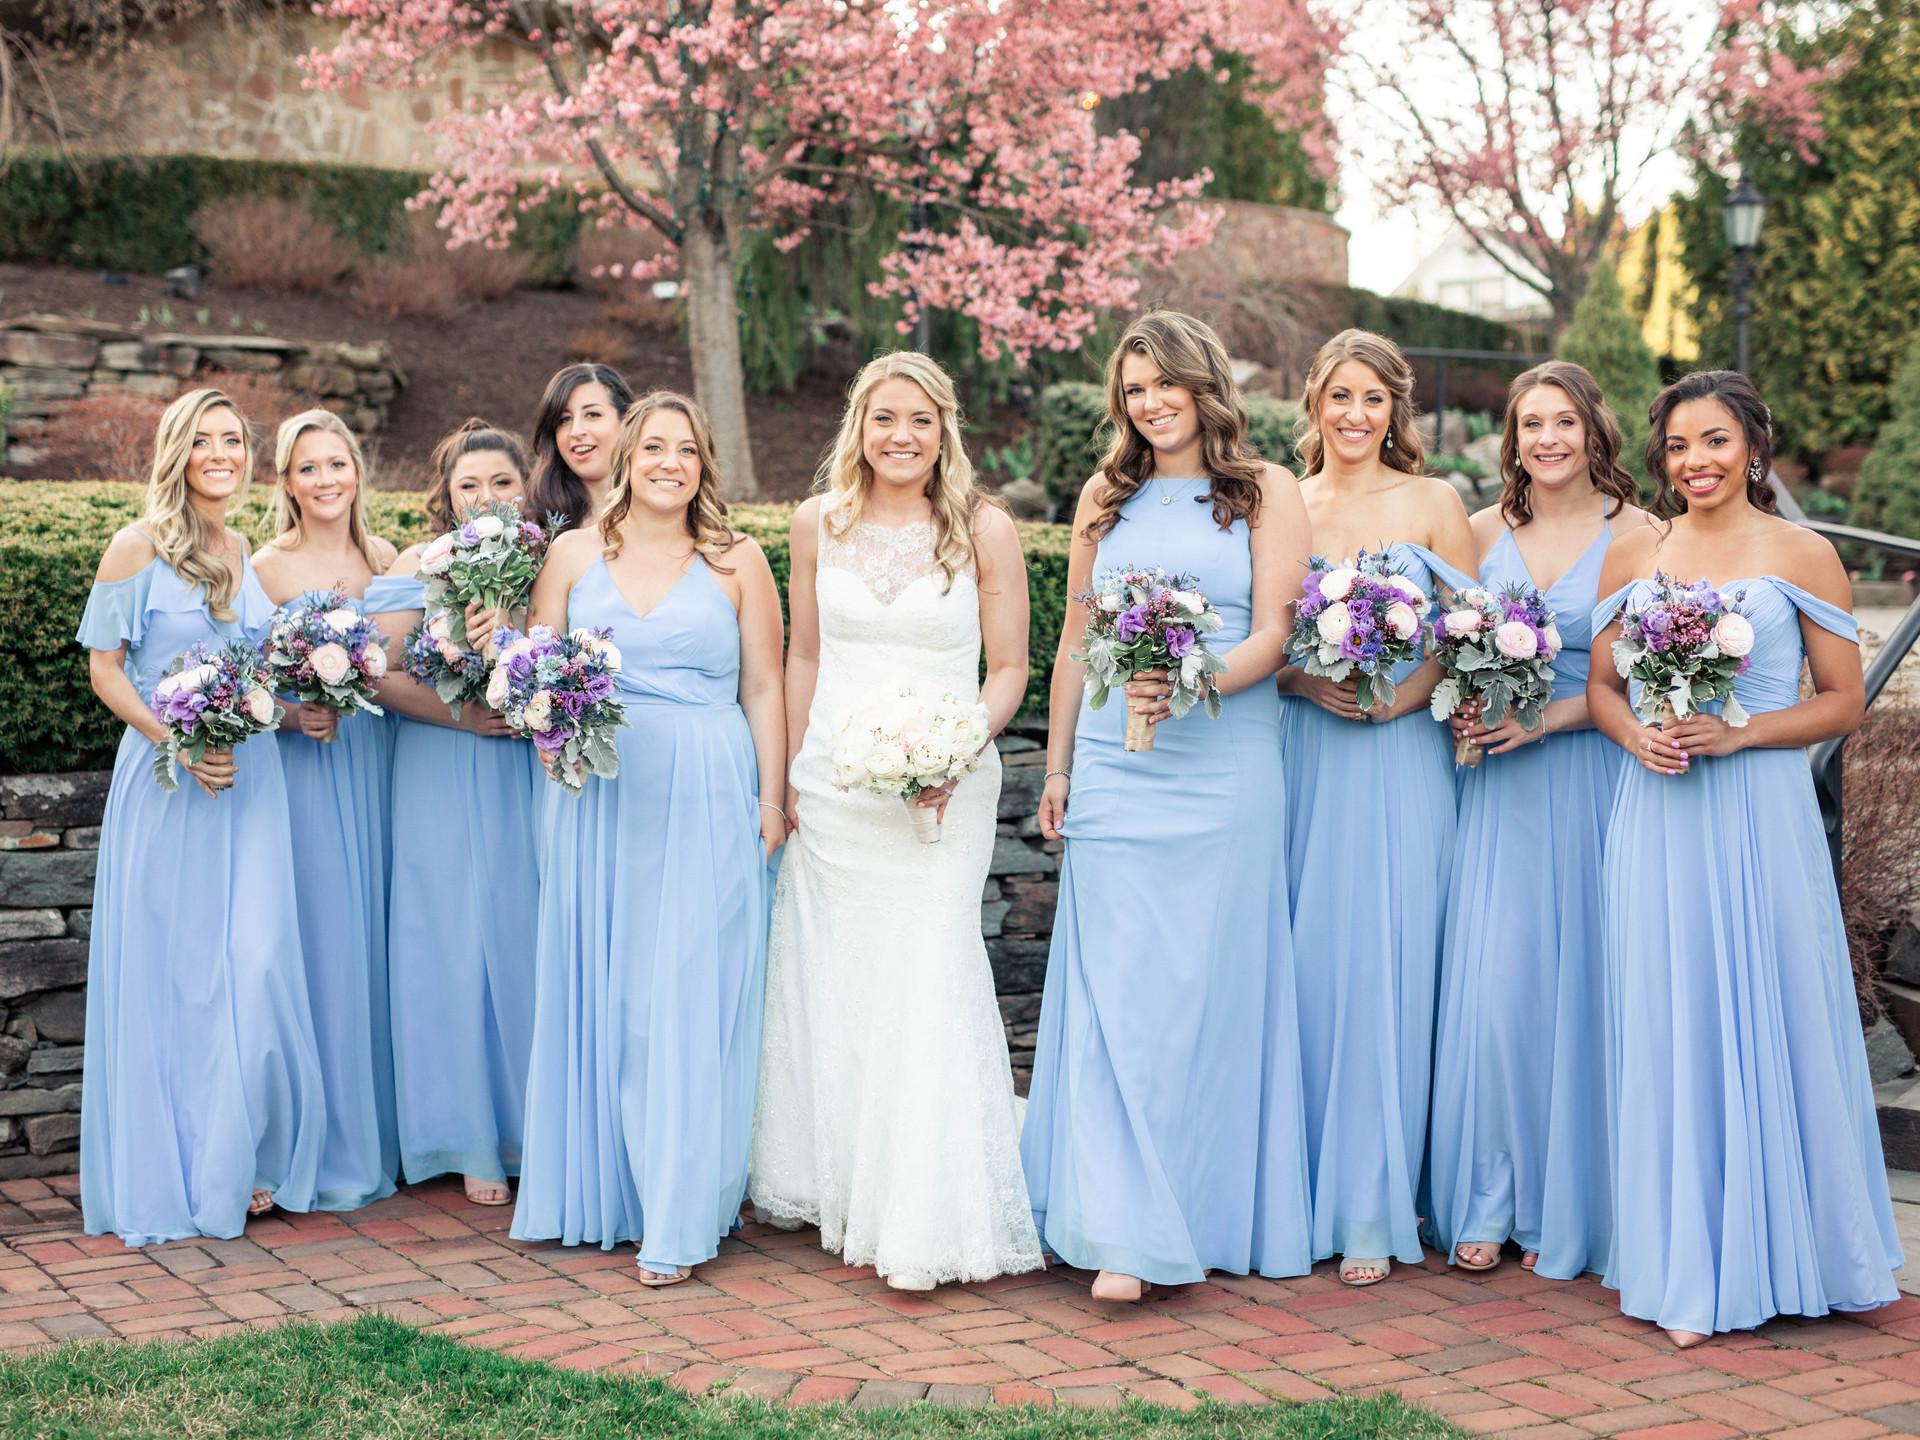 new-jersey-wedding-bridesmaids-bride-1.j